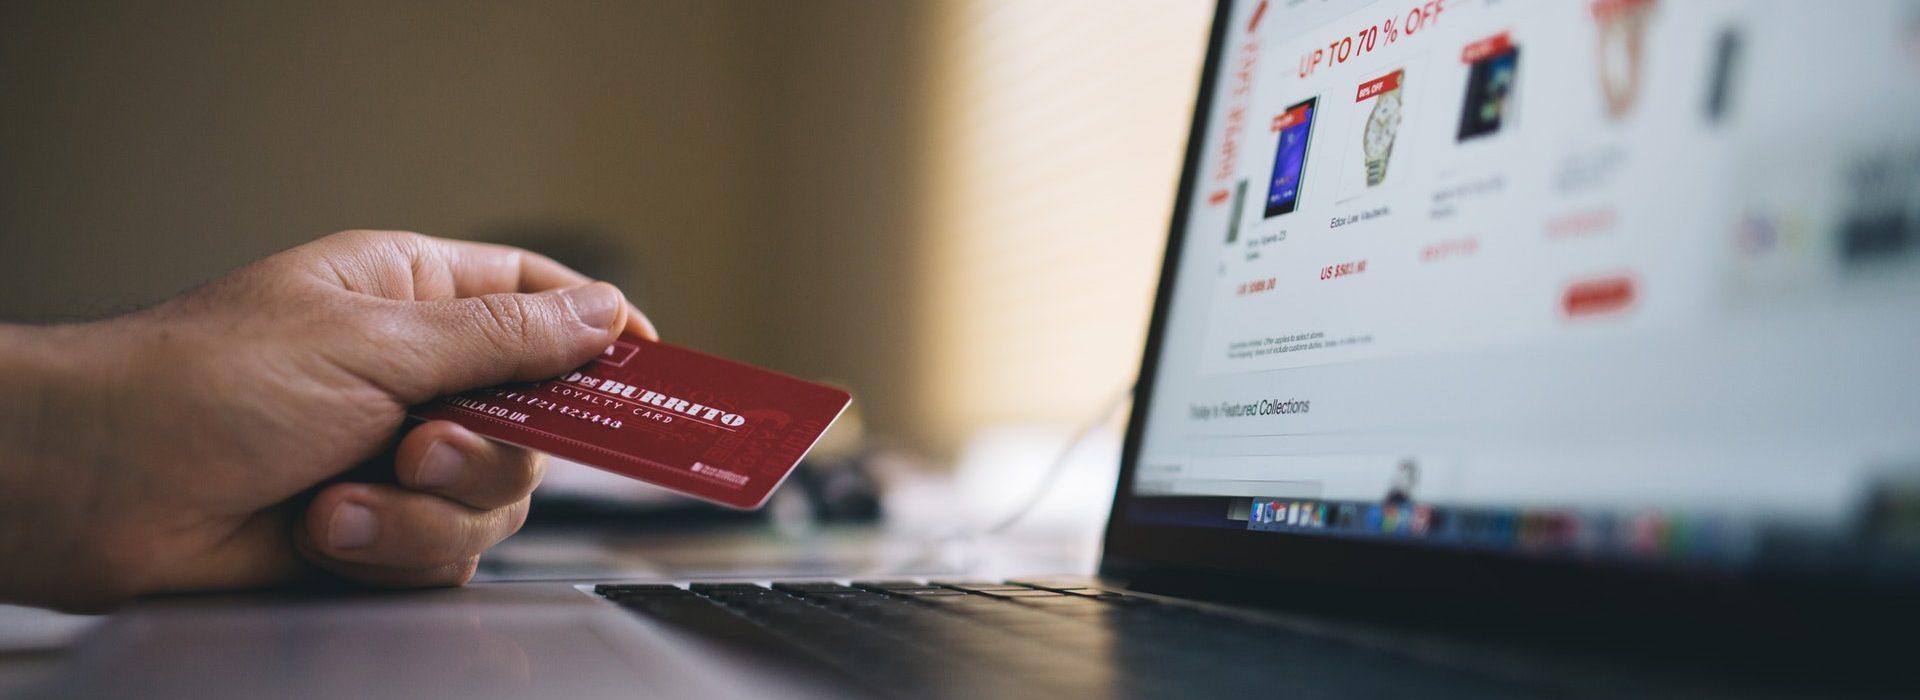 E-BusinessOnline | E-Commerce Solutions